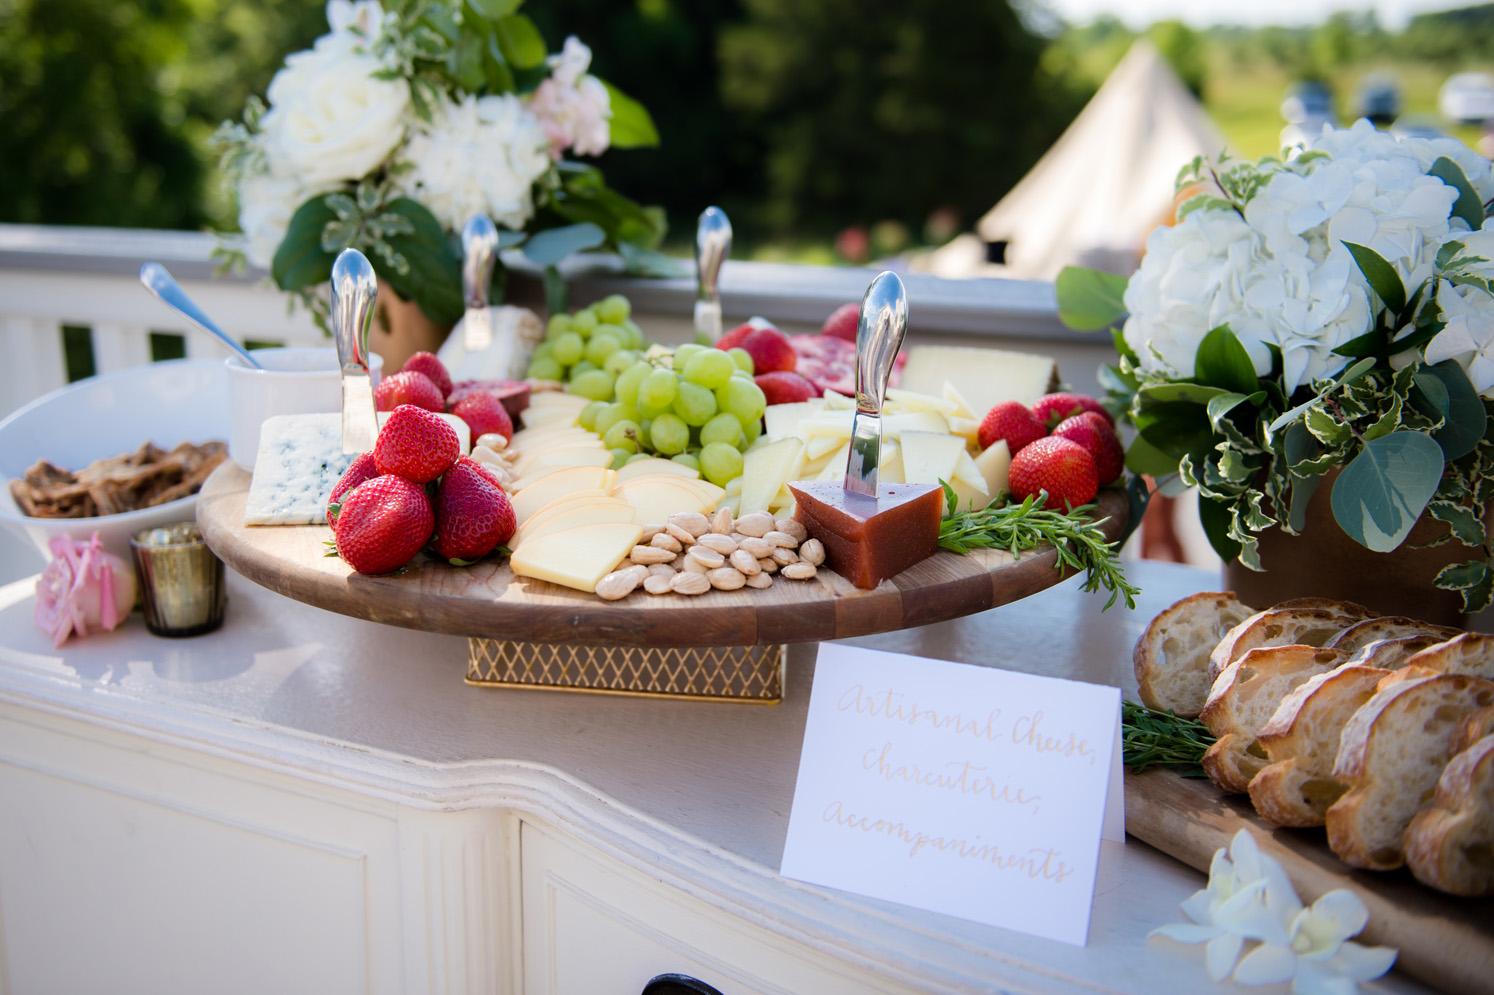 Kelly-Ewell-Photography-Tuesday-Together-Reston-Herndon-Dinner (15) (1).jpg